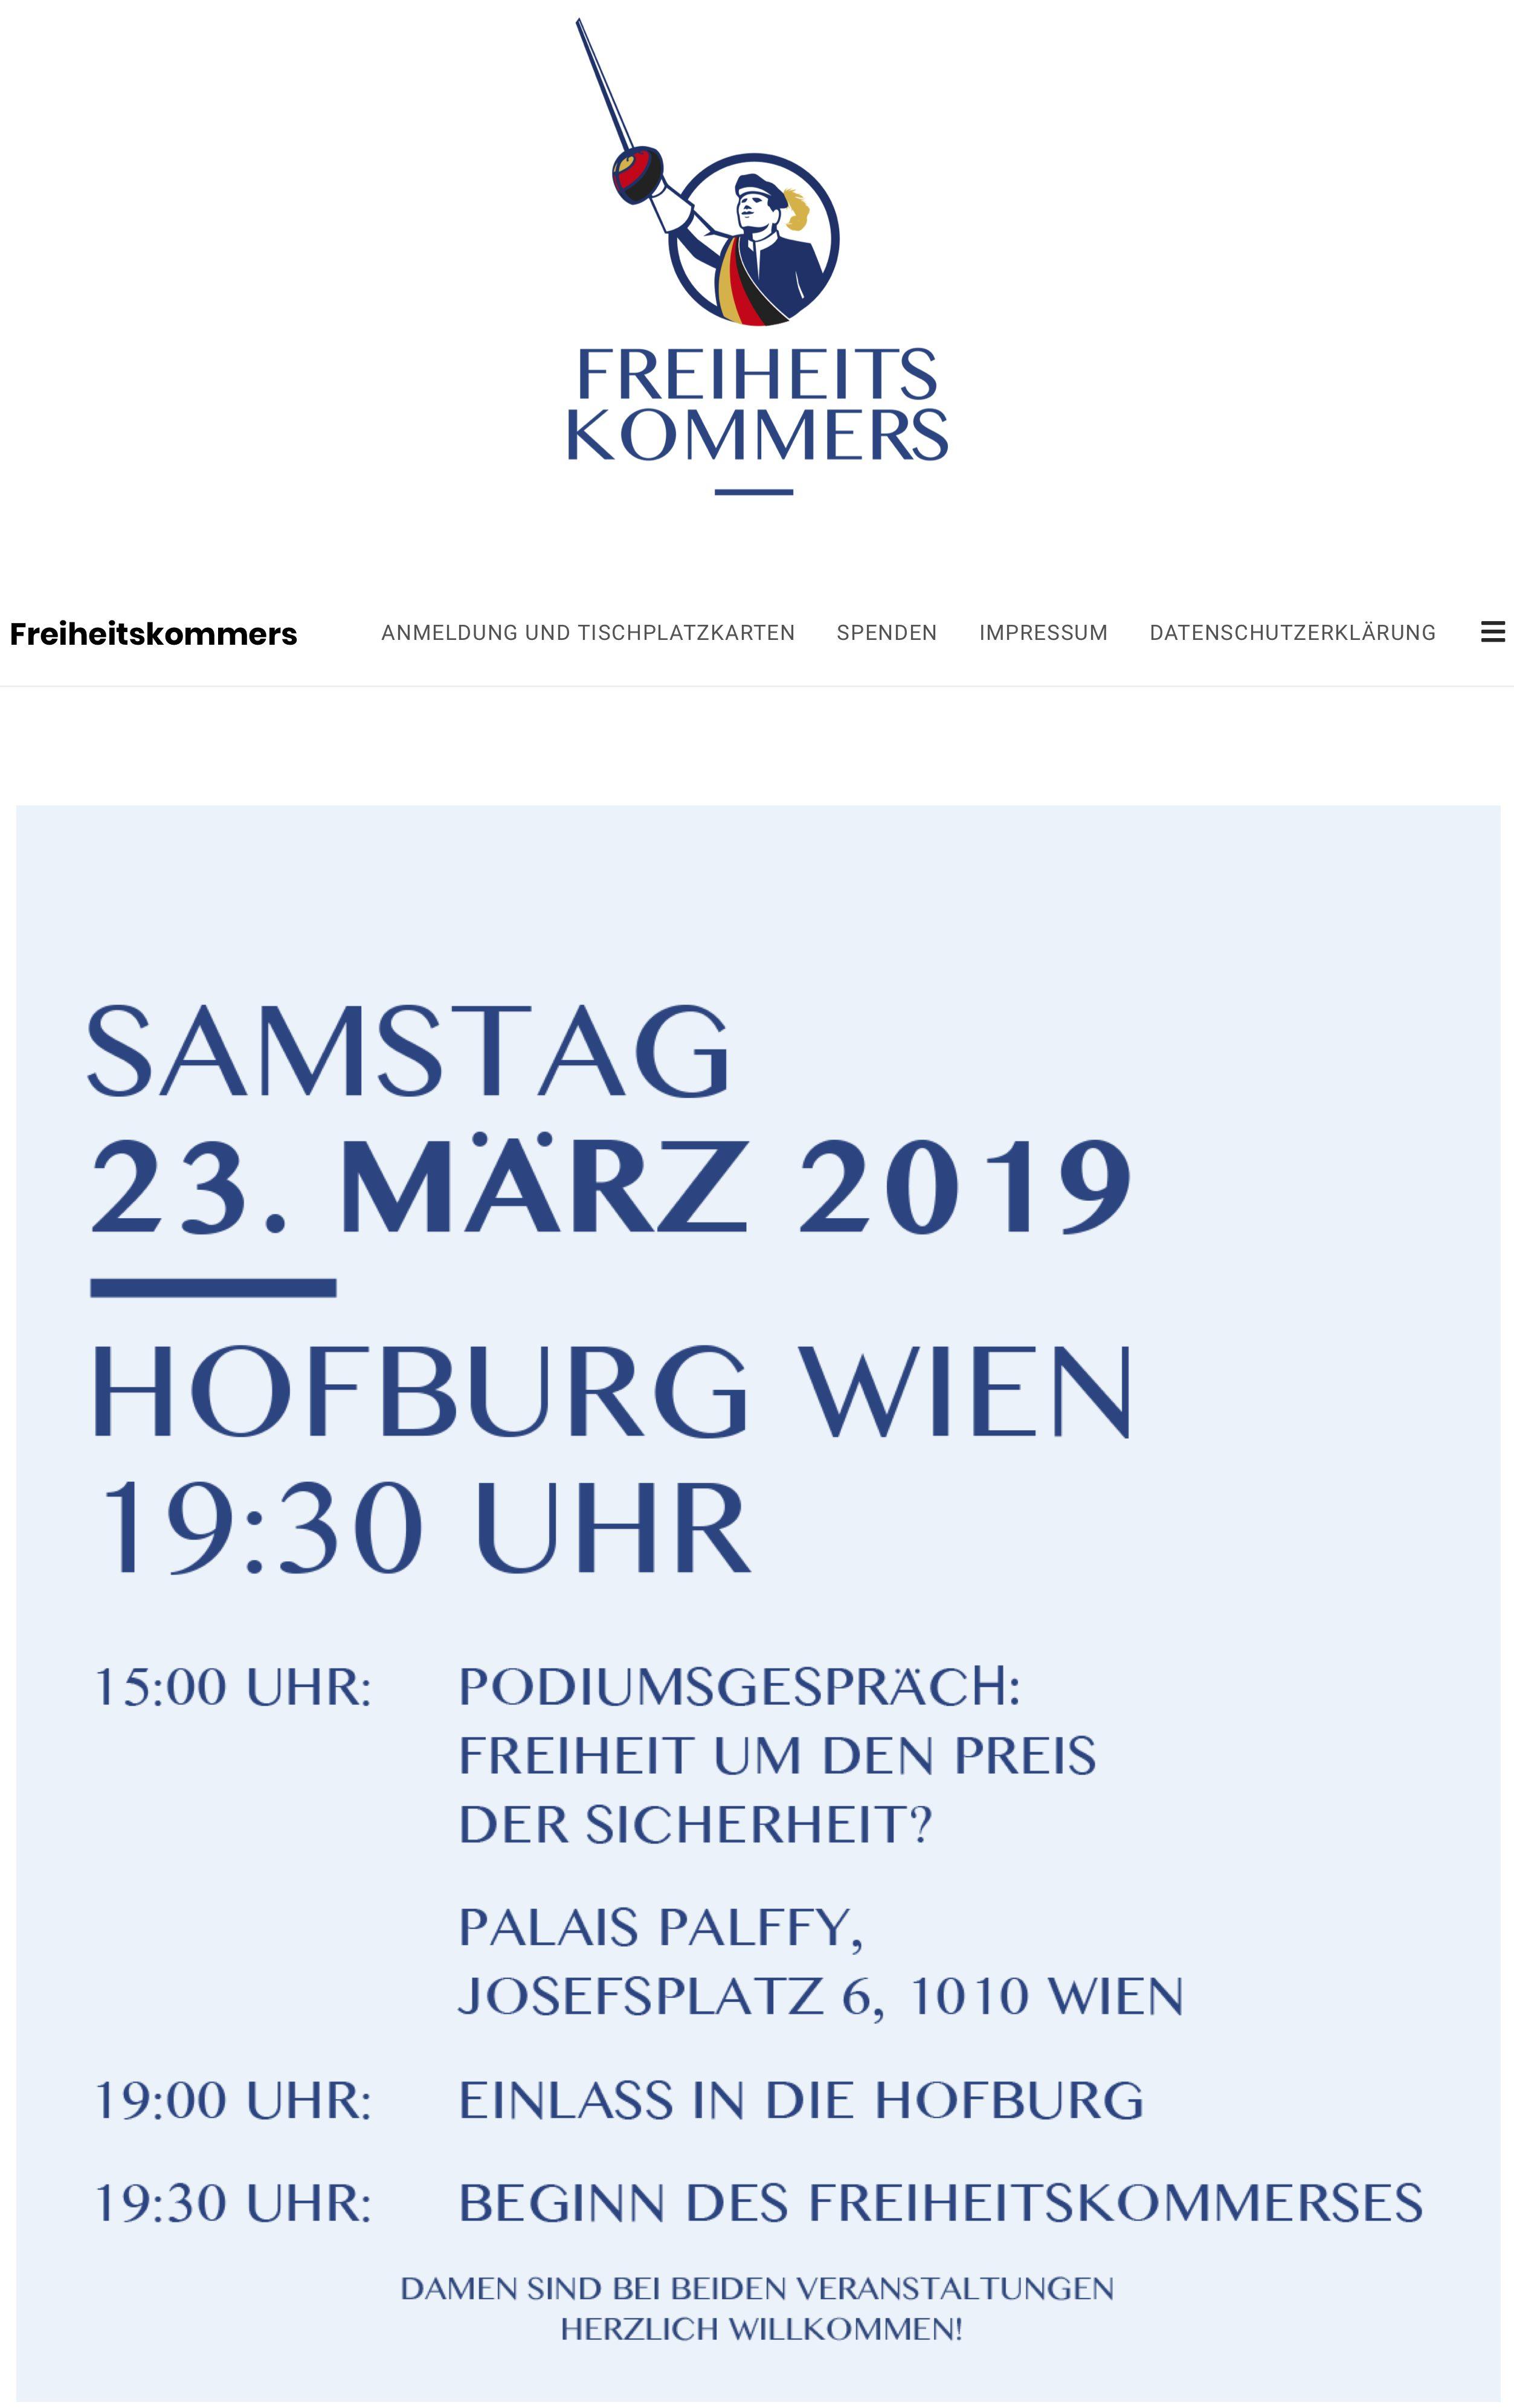 Ankündigung Freiheitskommers 23.3.19, Hofburg